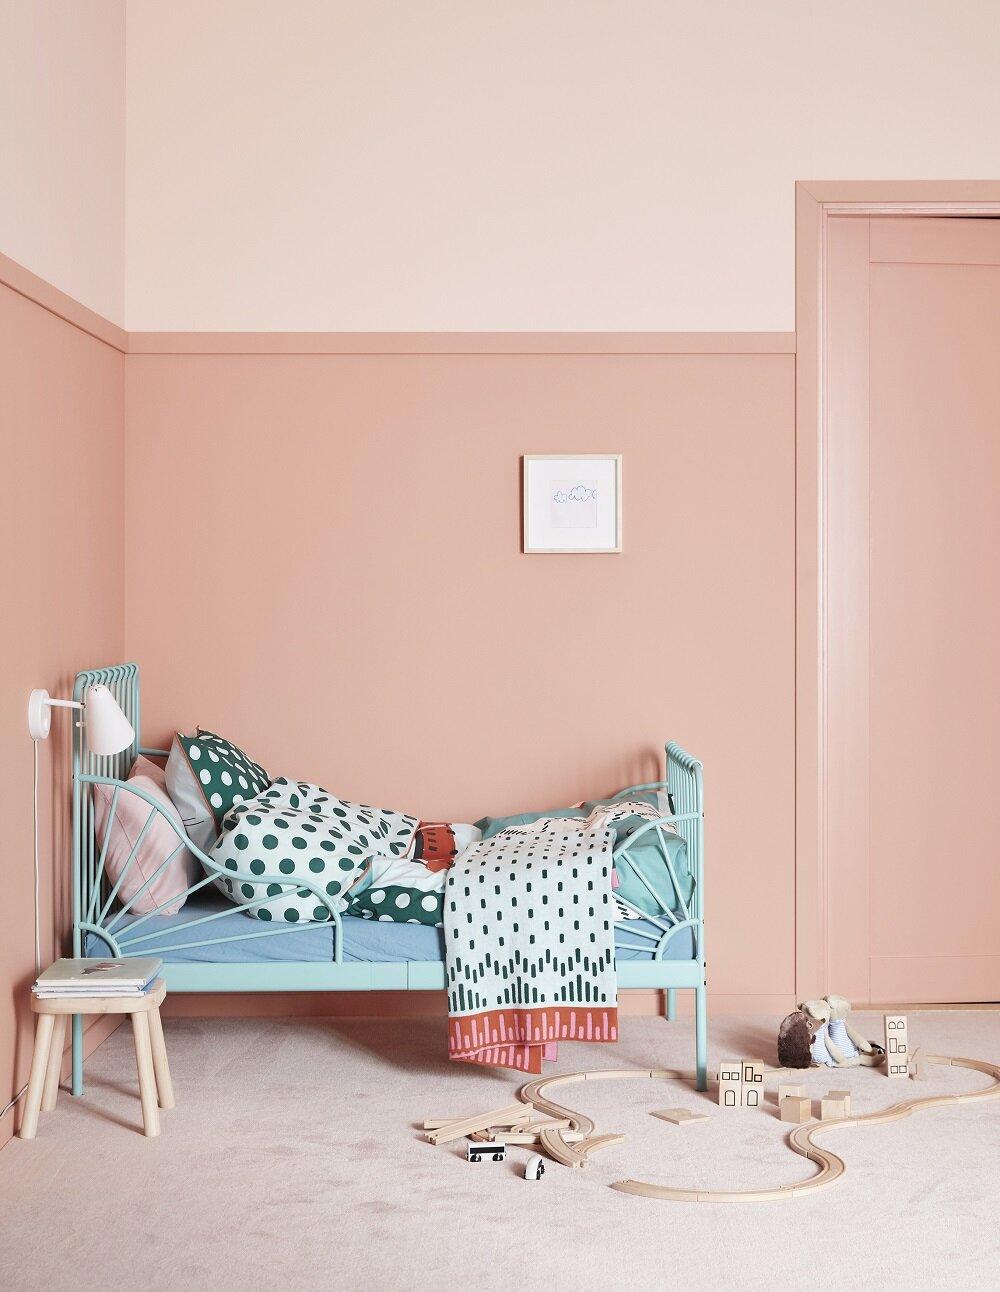 rustic ikea furniture catalog 2020   IKEA Spring Catalog 2020 — THE NORDROOM